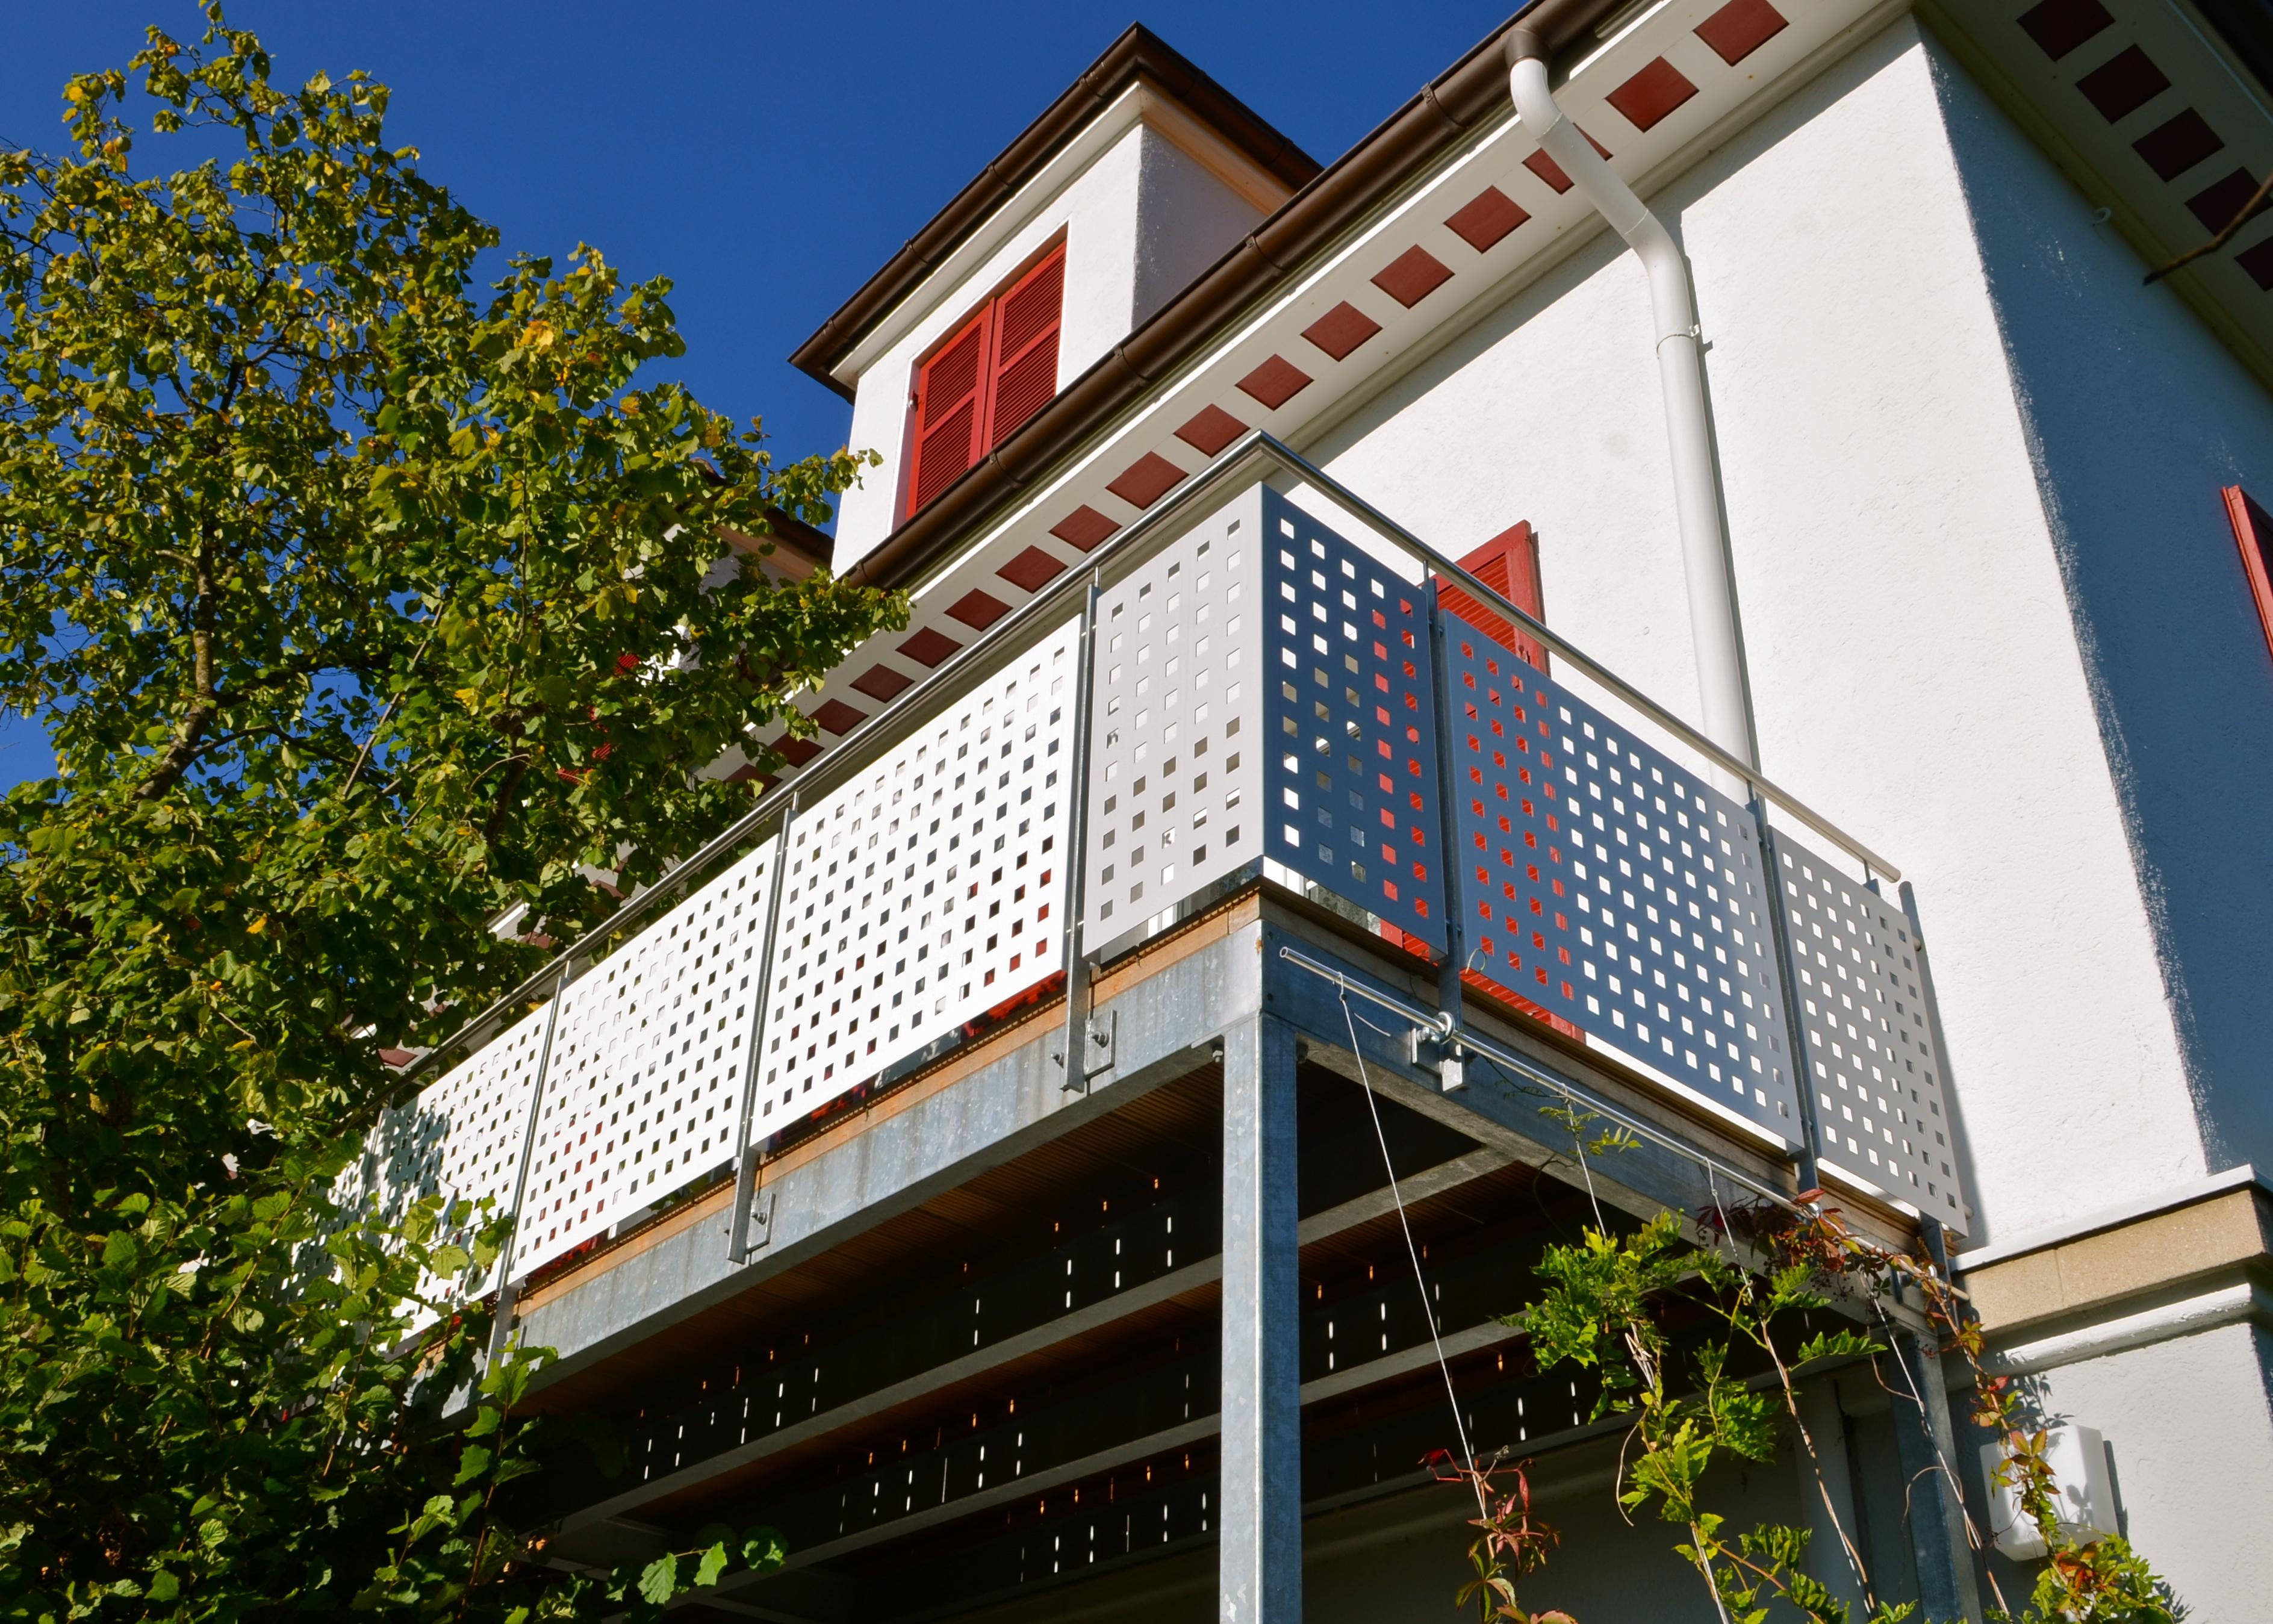 balkongel nder lorch stahlbau n gele. Black Bedroom Furniture Sets. Home Design Ideas